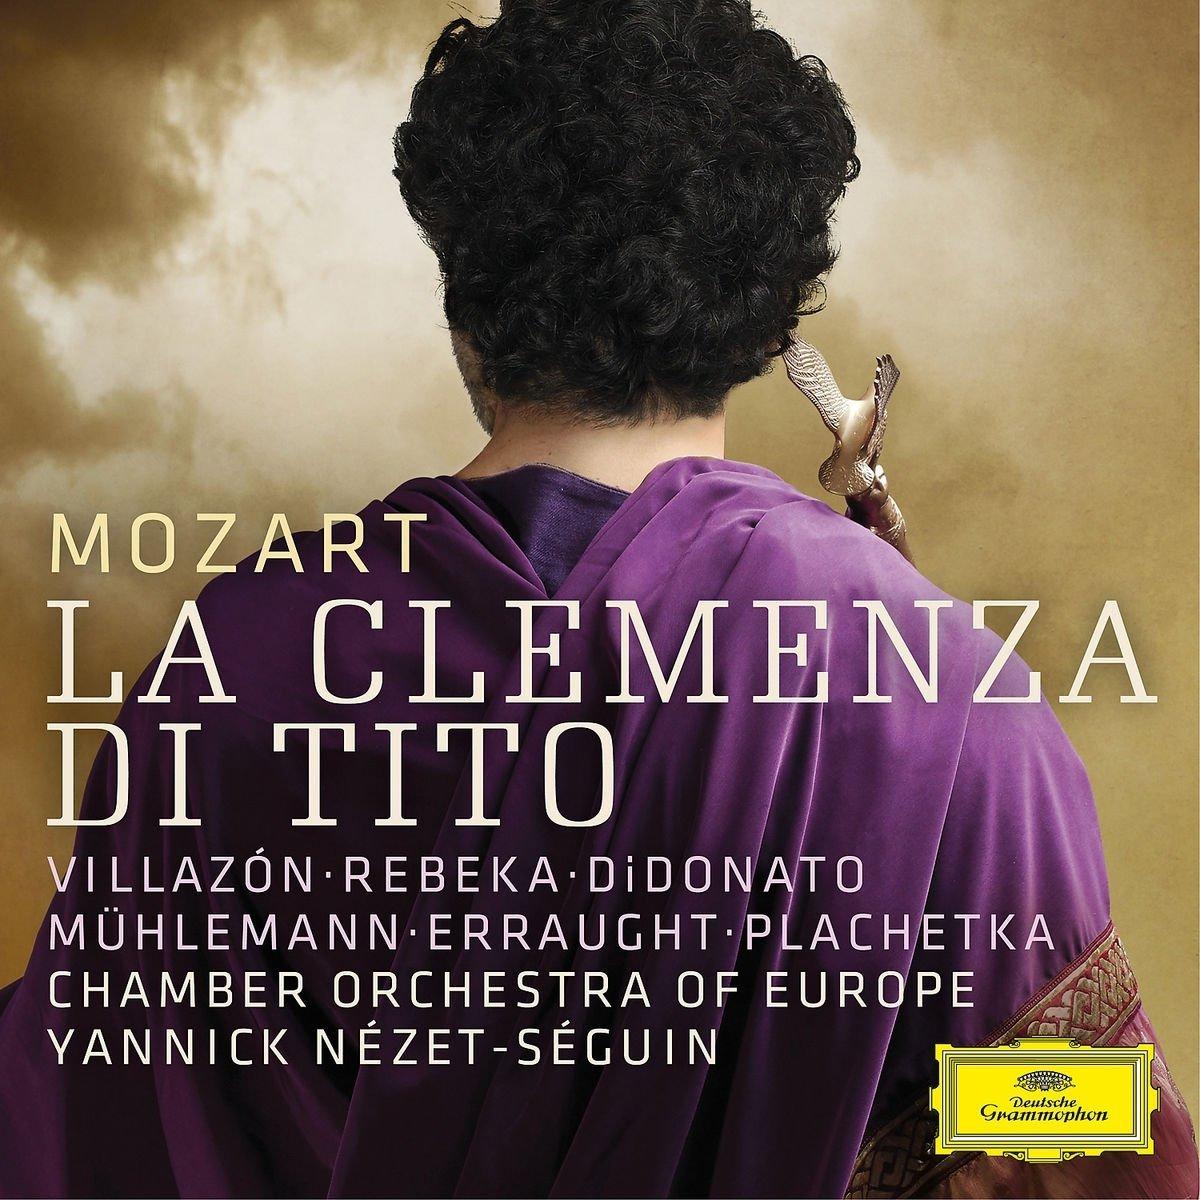 IN REVIEW: Wolfgang Amadeus Mozart - LA CLEMENZA DI TITO, K. 621 (Deutsche Grammophon 483 5210)